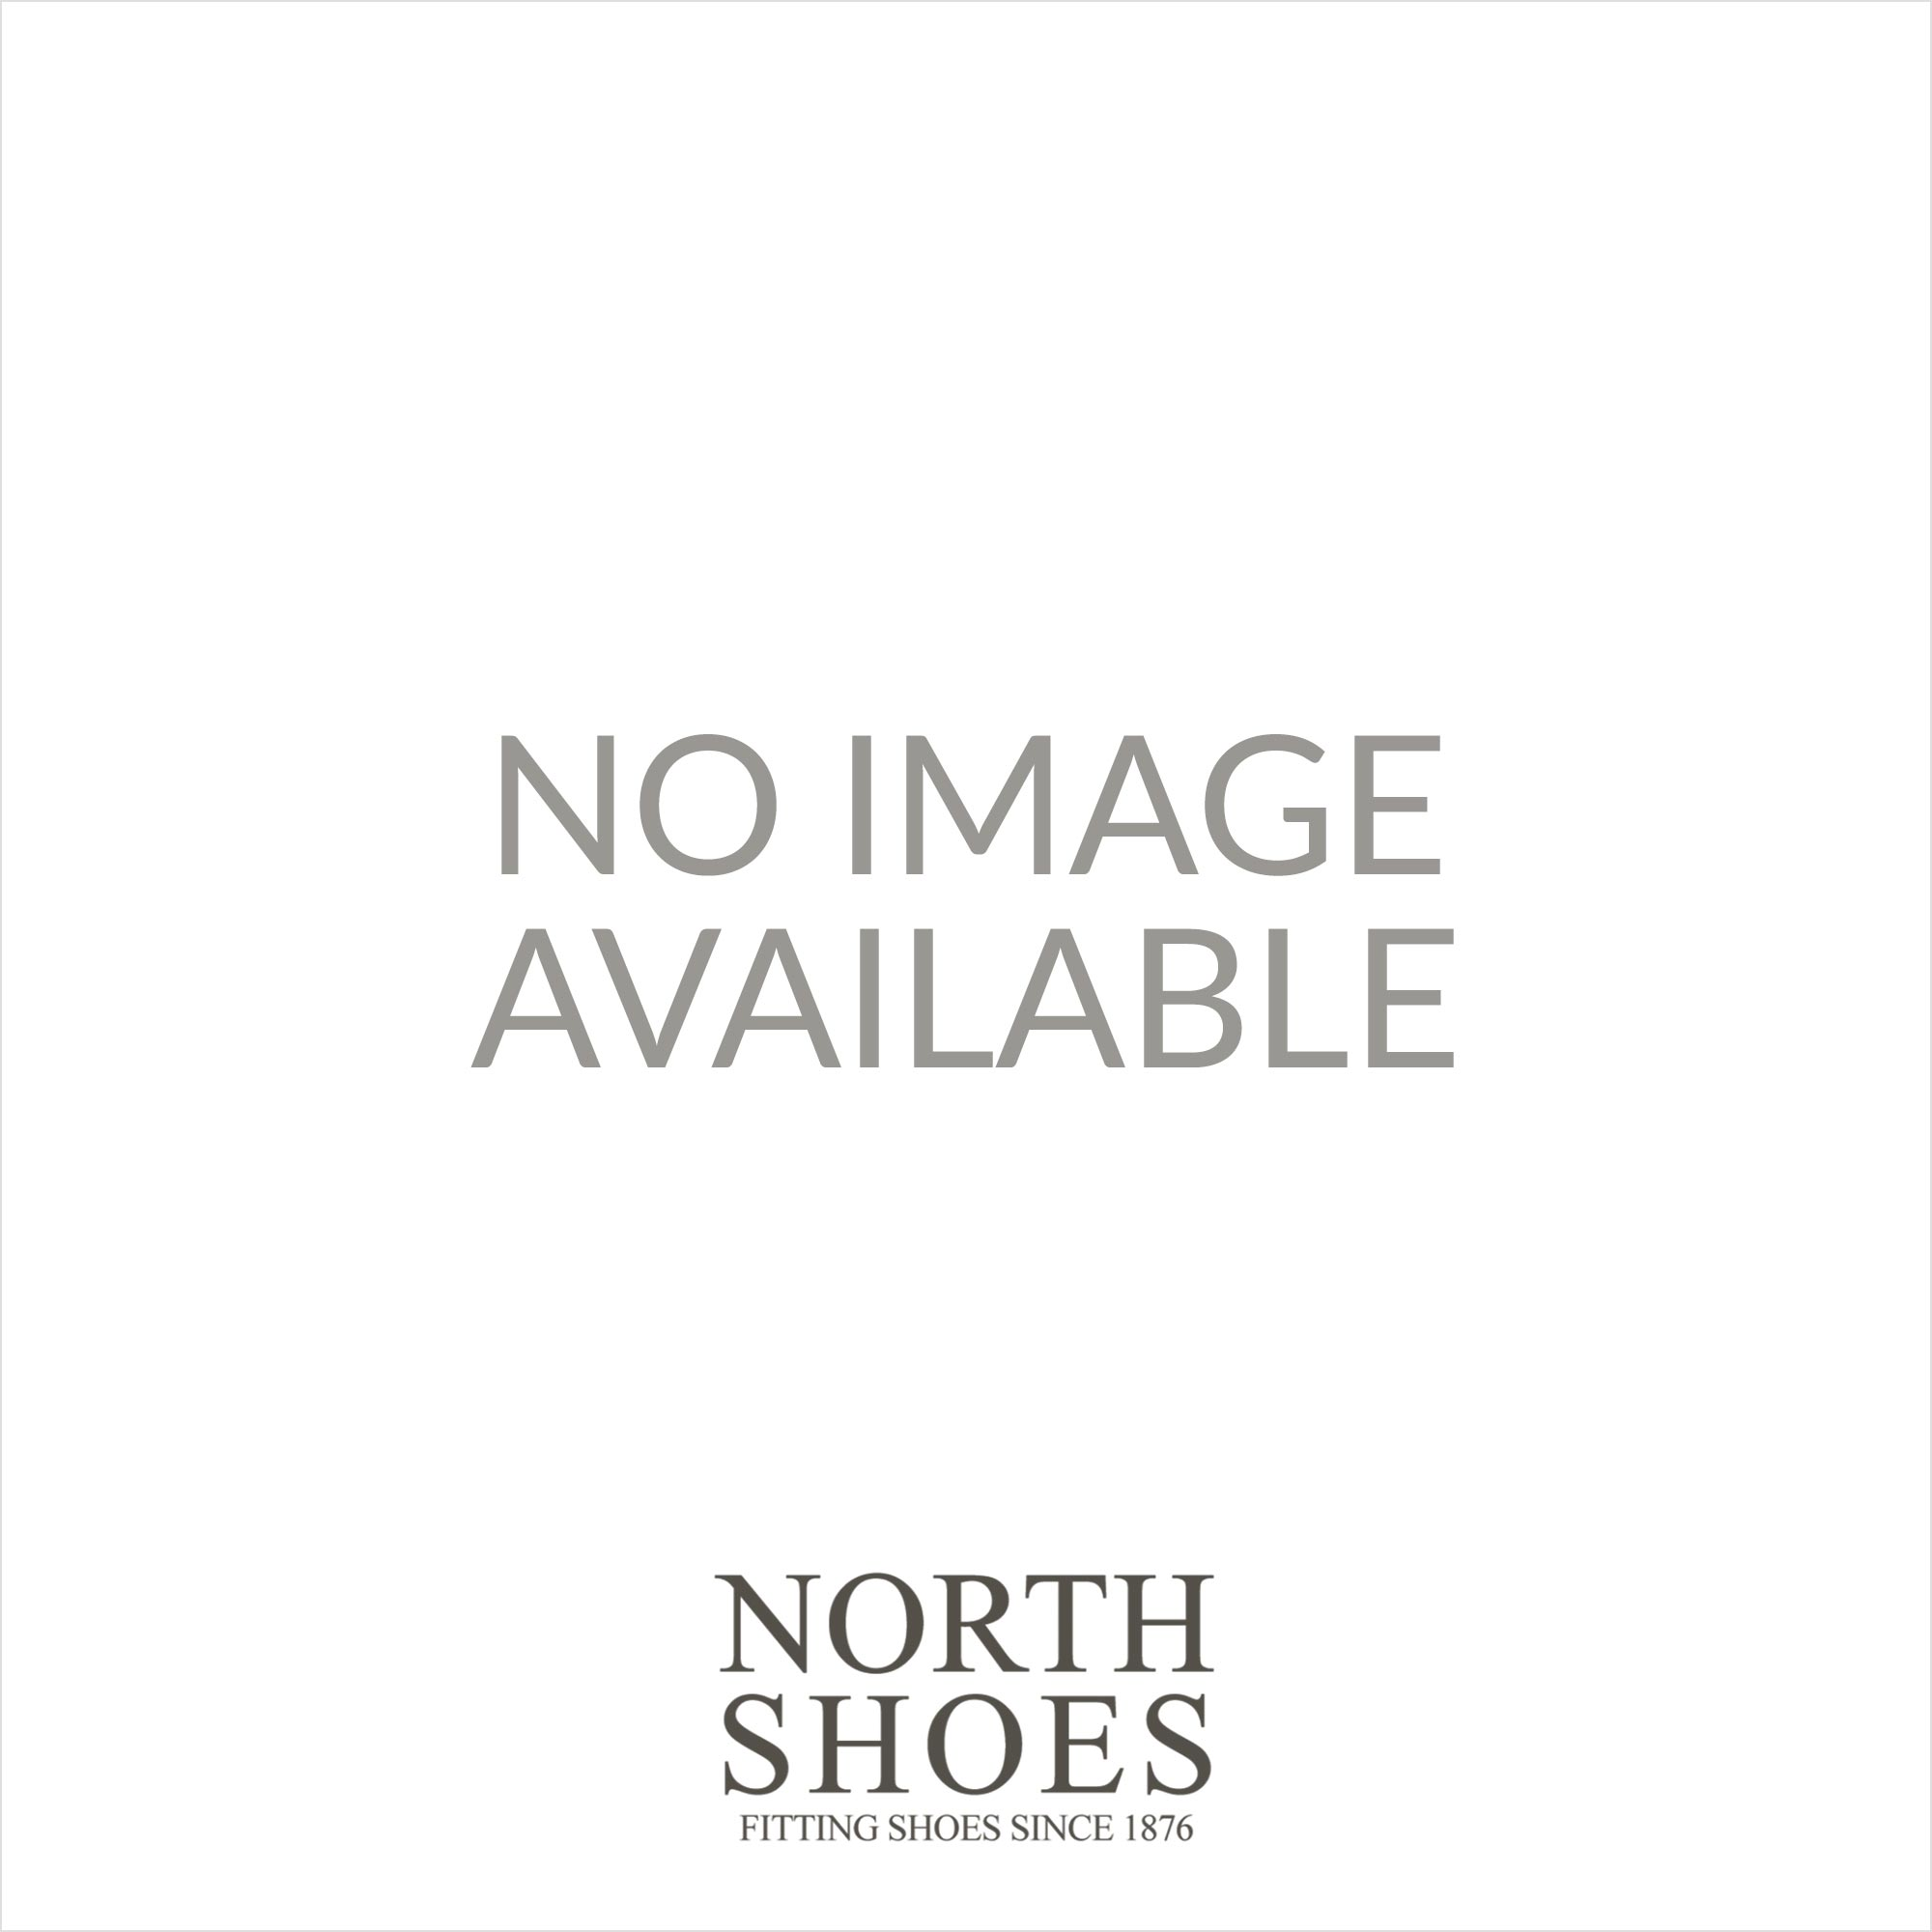 4099f880ecad TONI PONS Calpe Raspberry Womens Sandal - TONI PONS from .